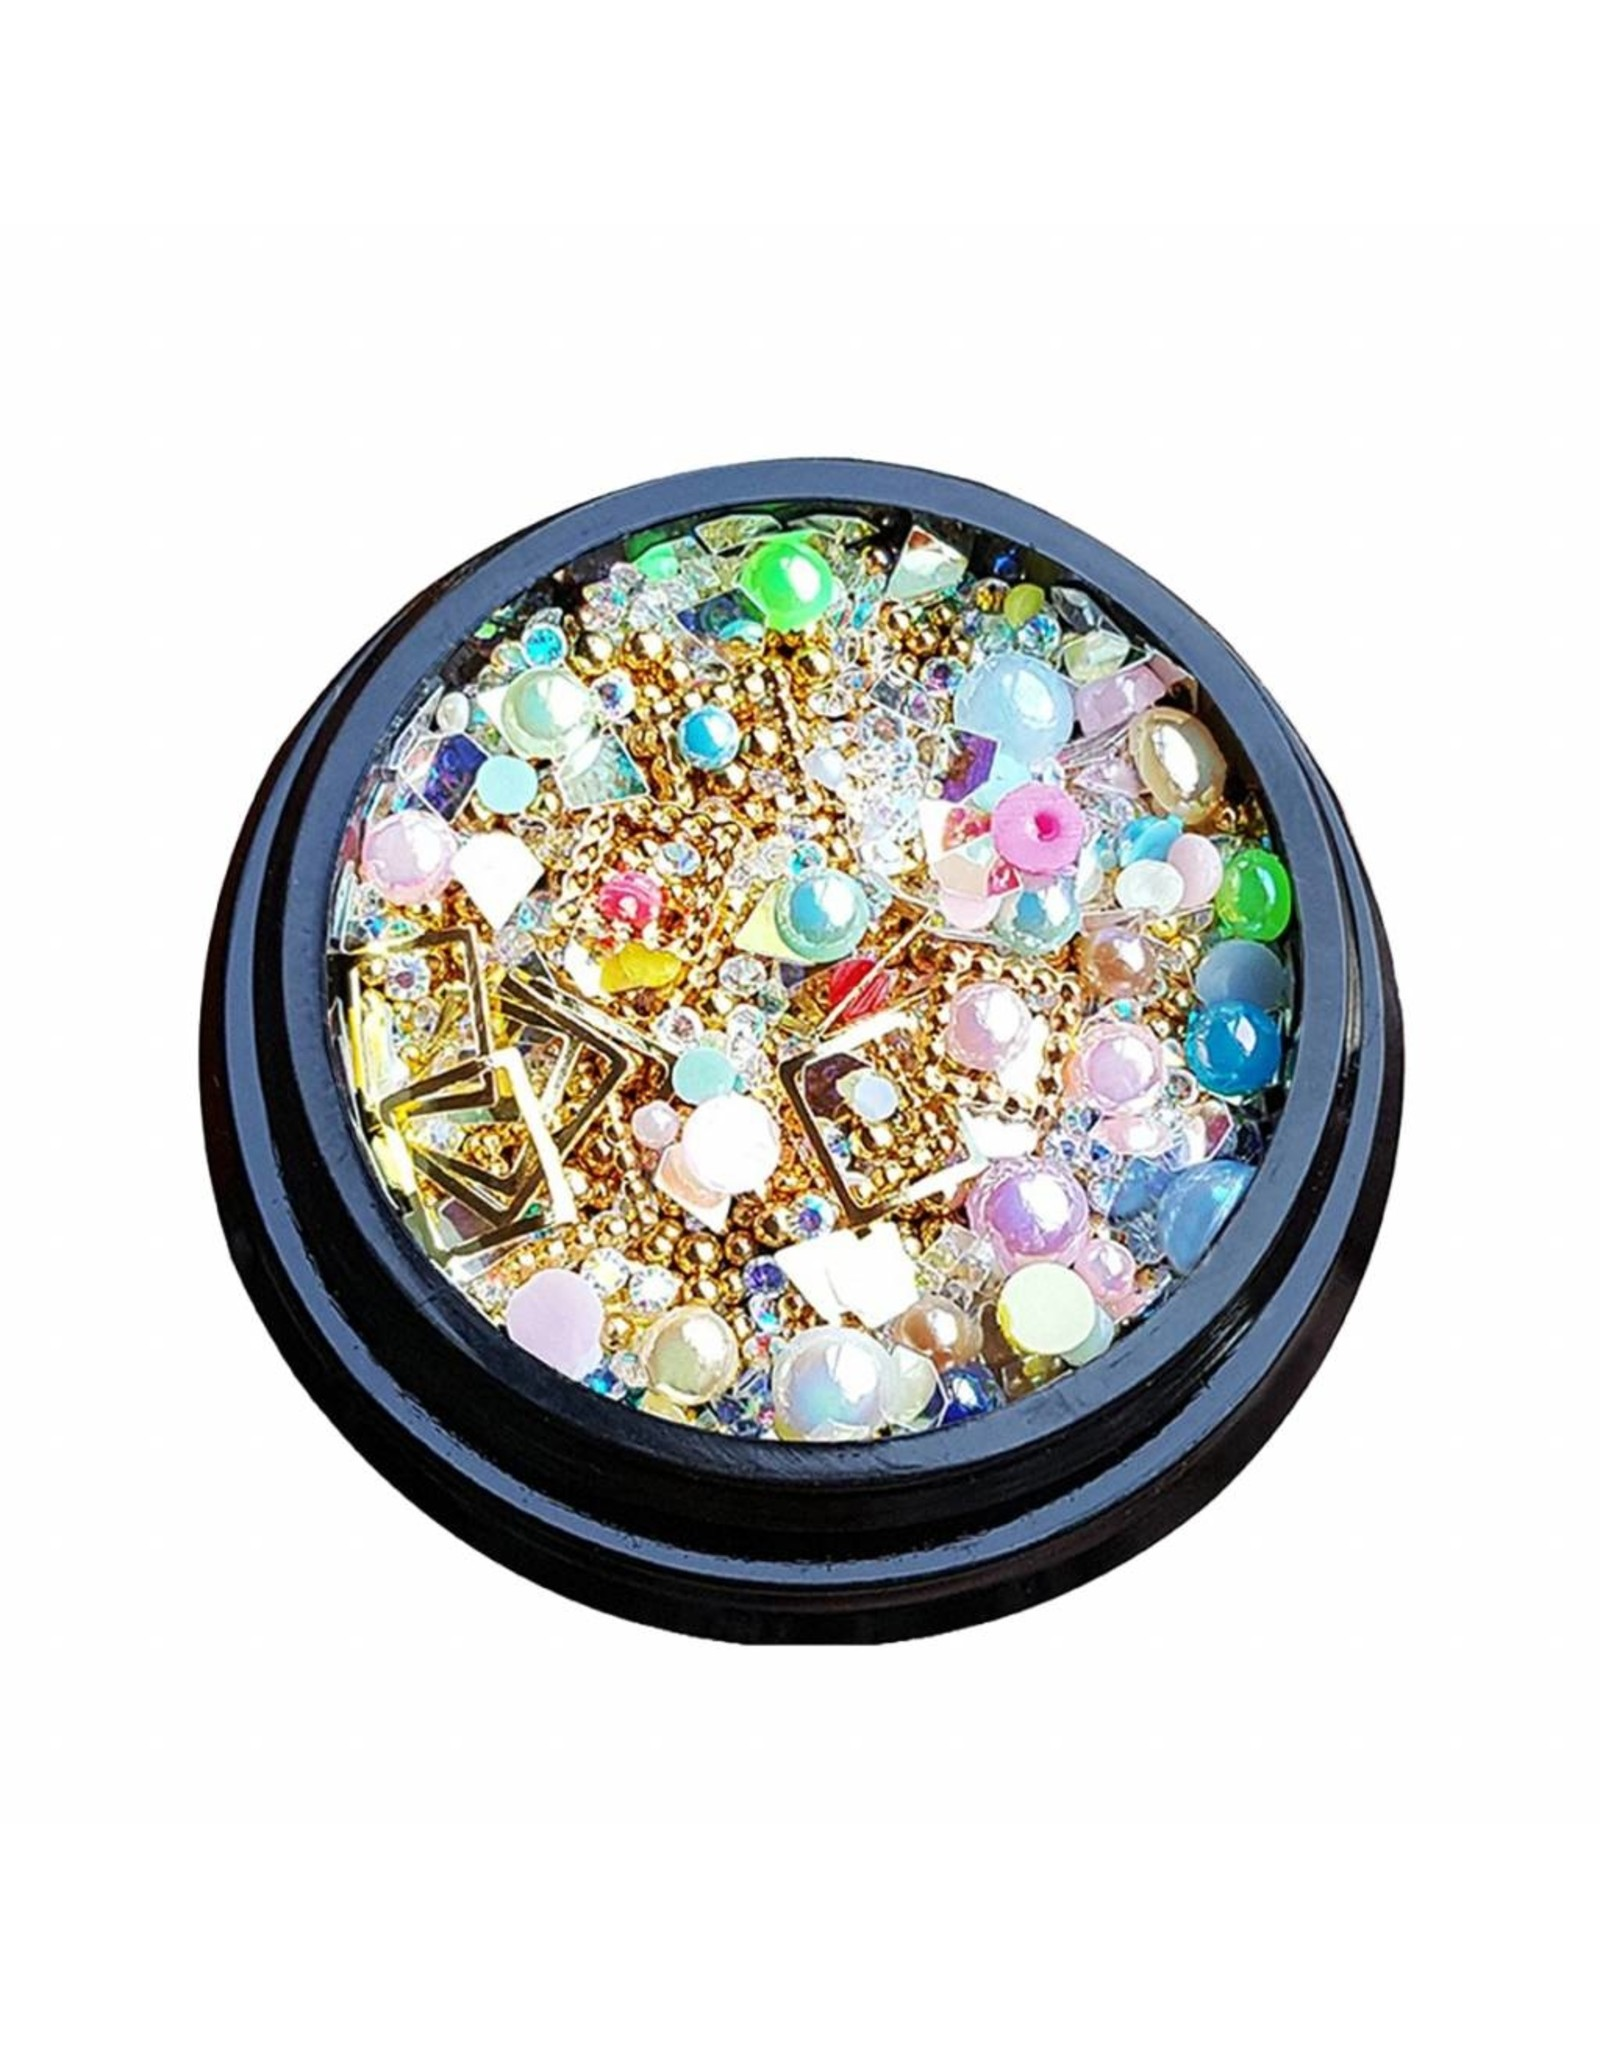 Merkloos 3D Mix of luxurious jewelry  (04)